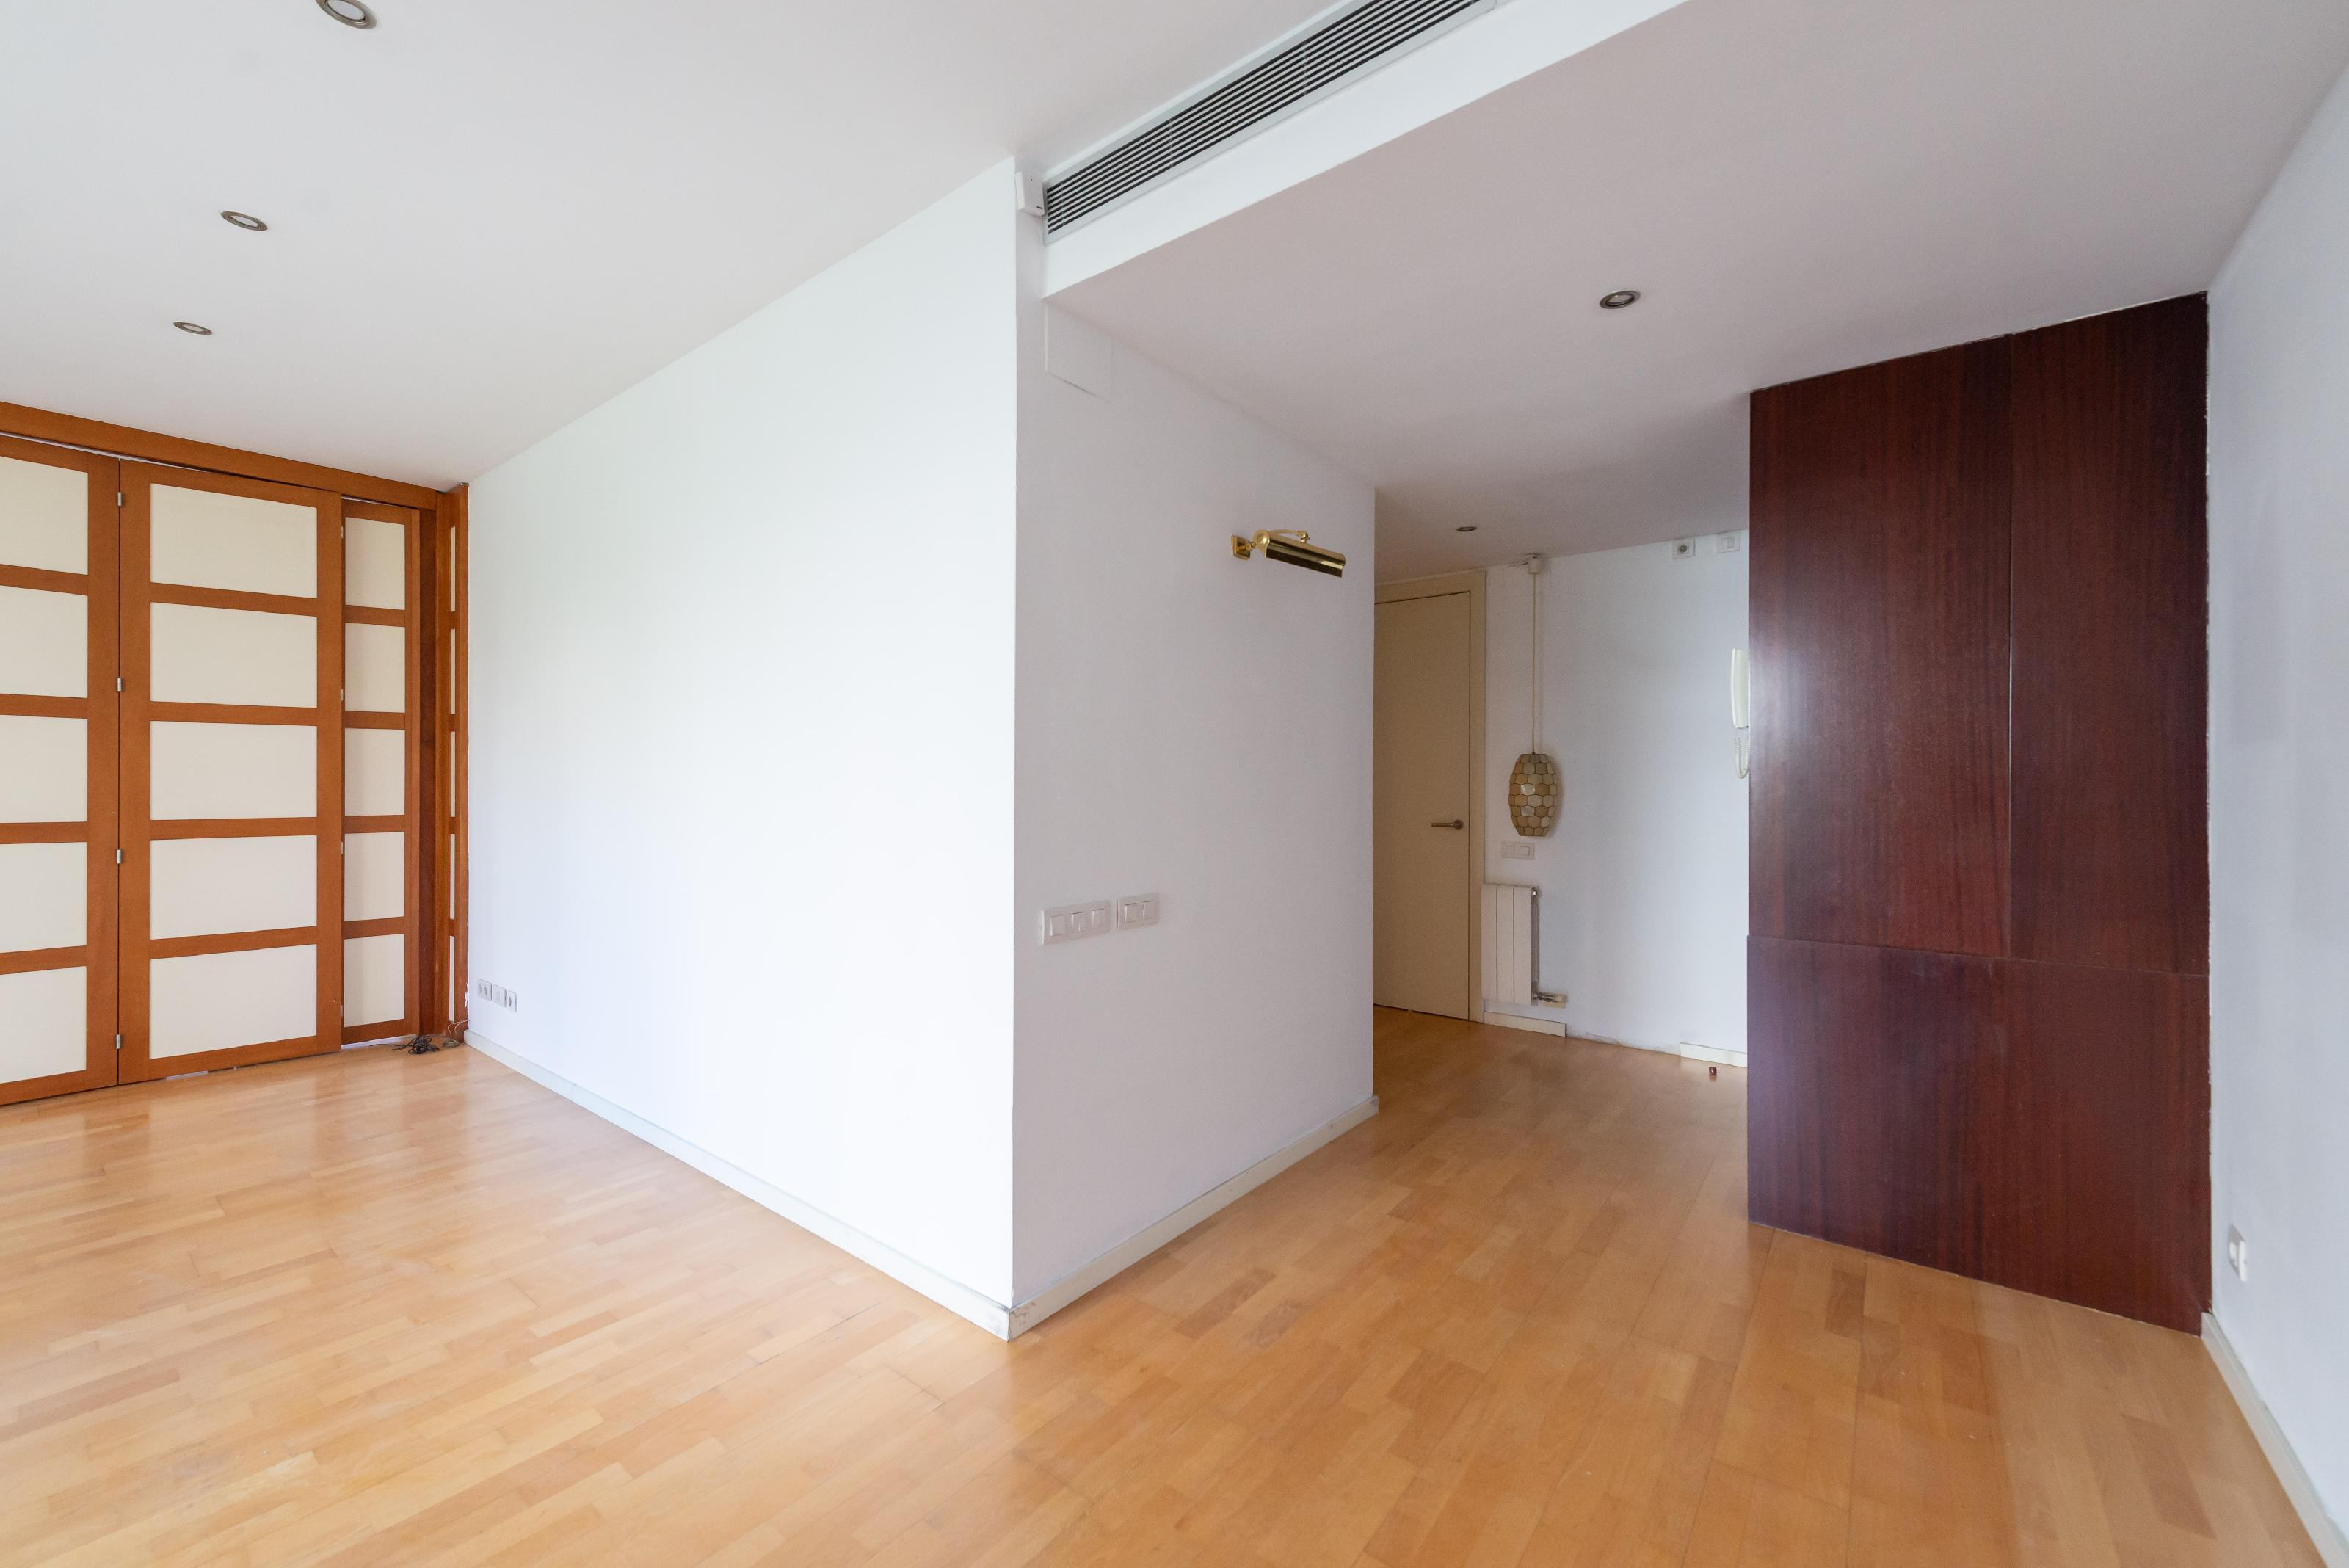 251446 Flat for sale in Sarrià-Sant Gervasi, Tres Torres 7